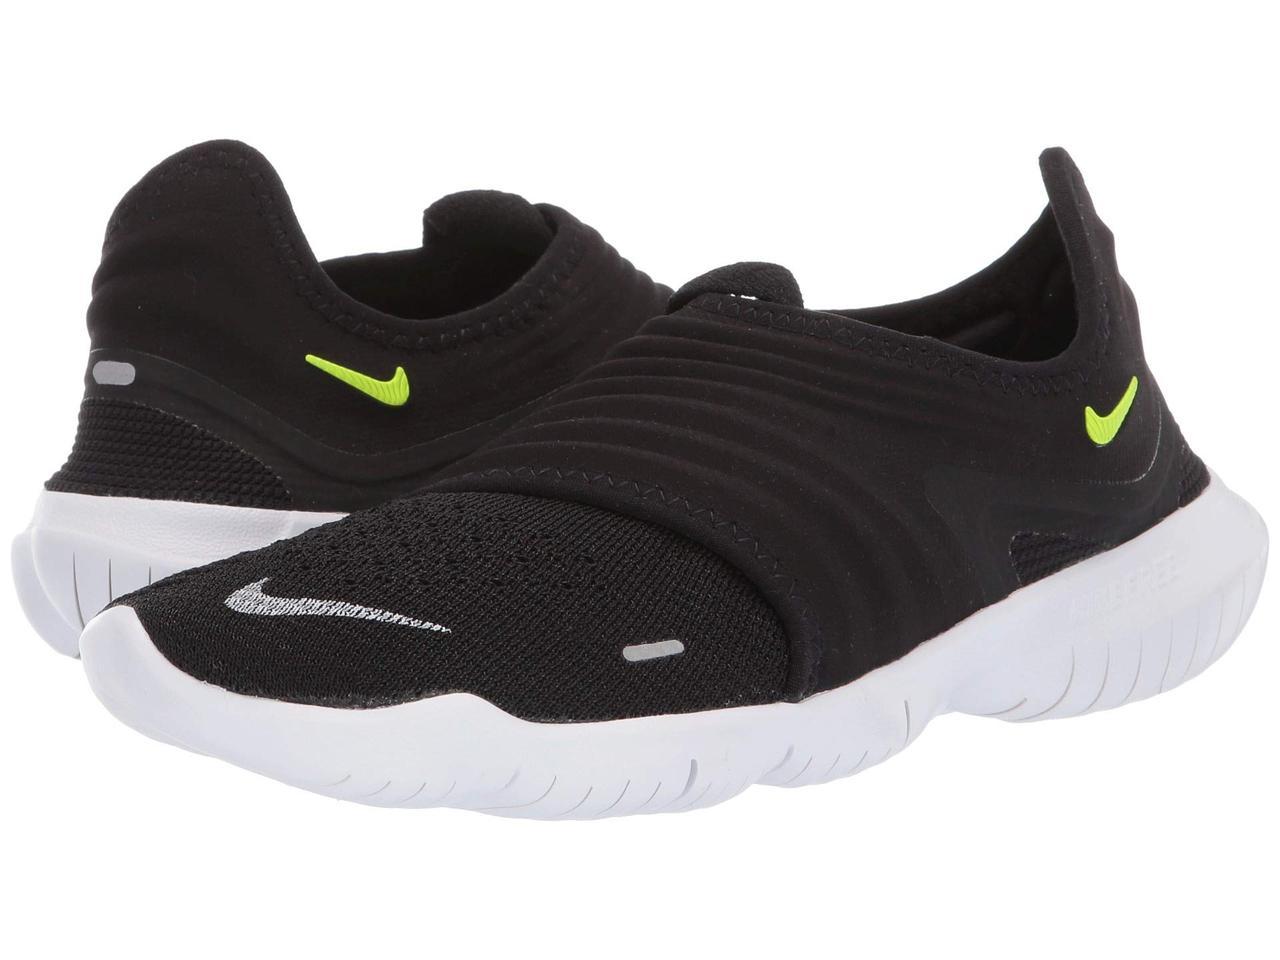 262fb561 Кроссовки/Кеды (Оригинал) Nike Free RN Flyknit 3.0 Black/Volt/White ...